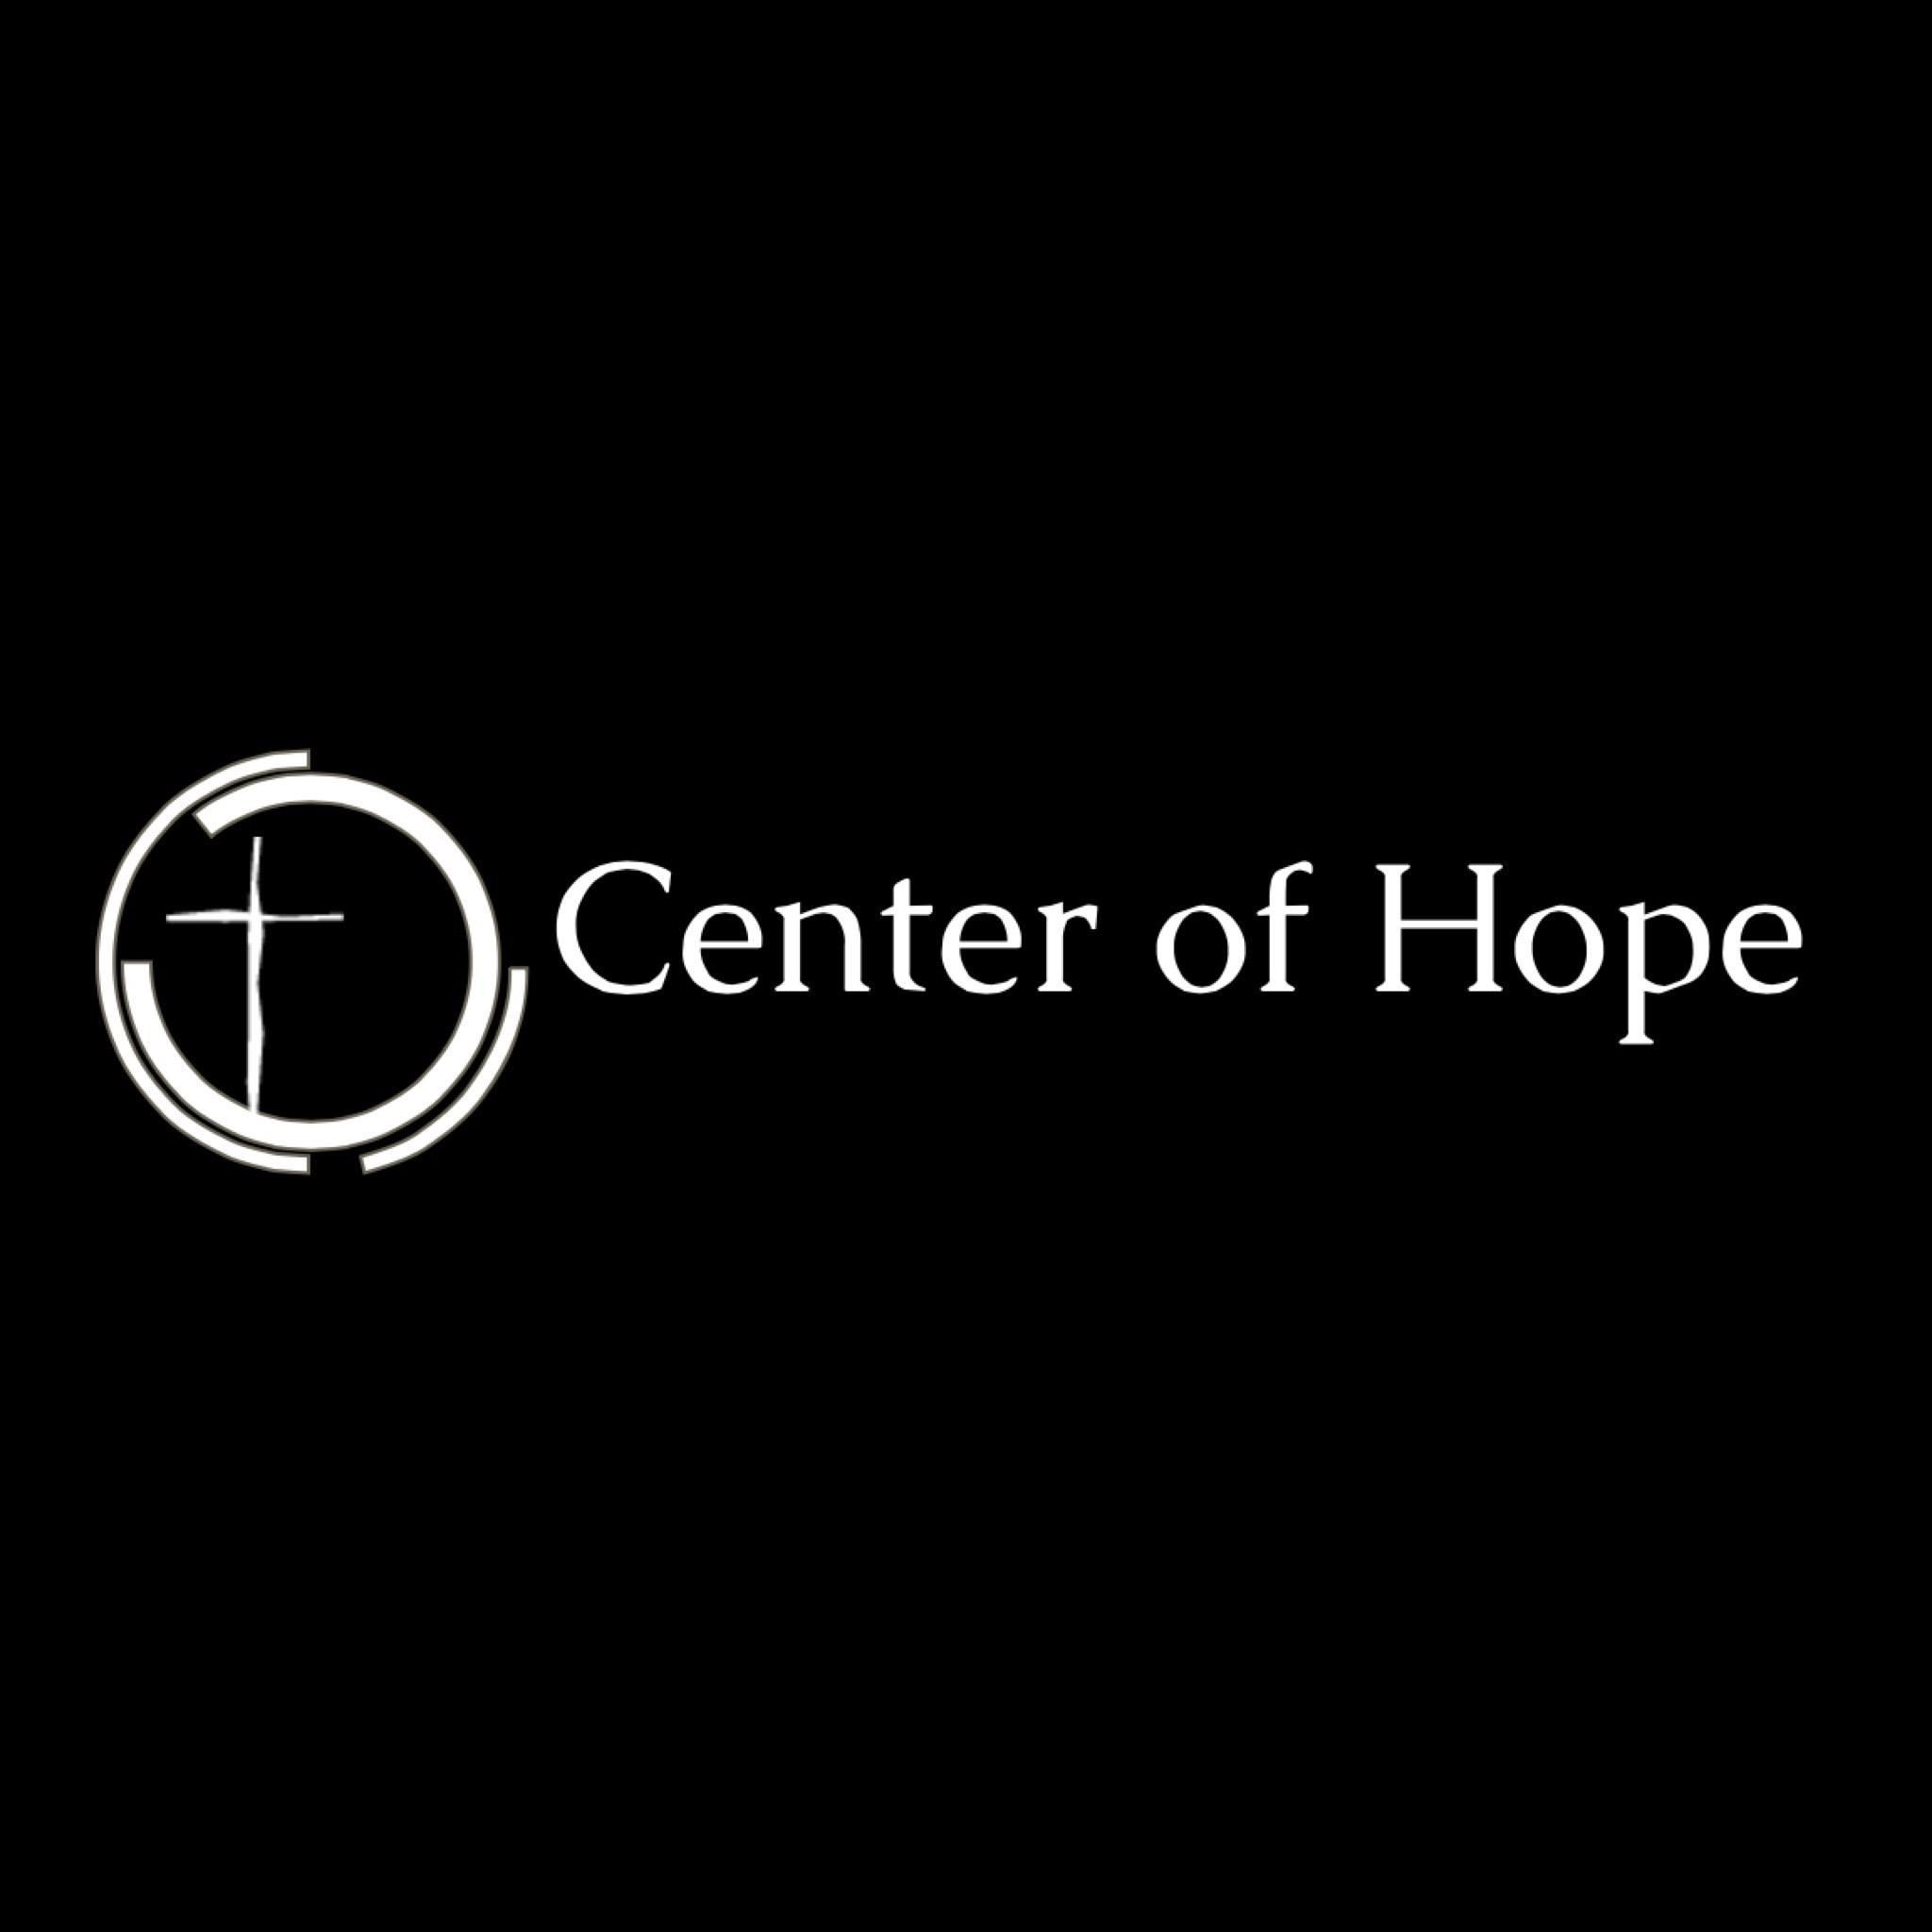 Center of Hope Evansville